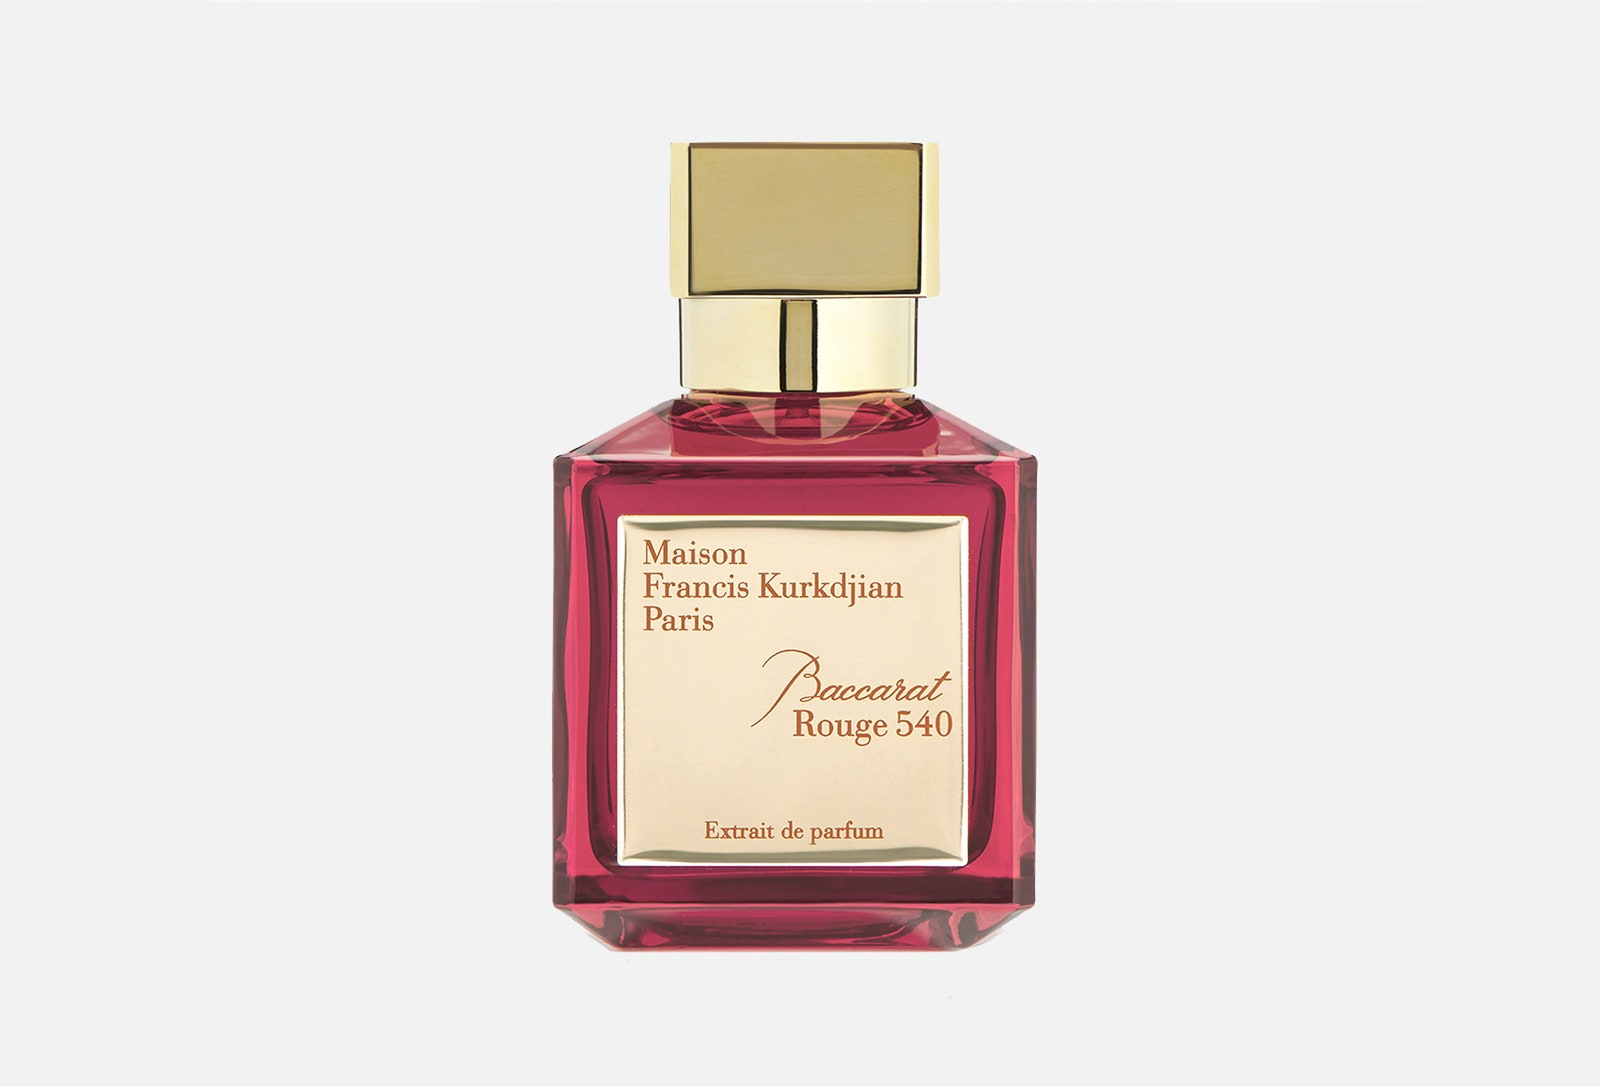 Baccarat Rouge 540 Maison Francis Kurkdjian 32 240 .